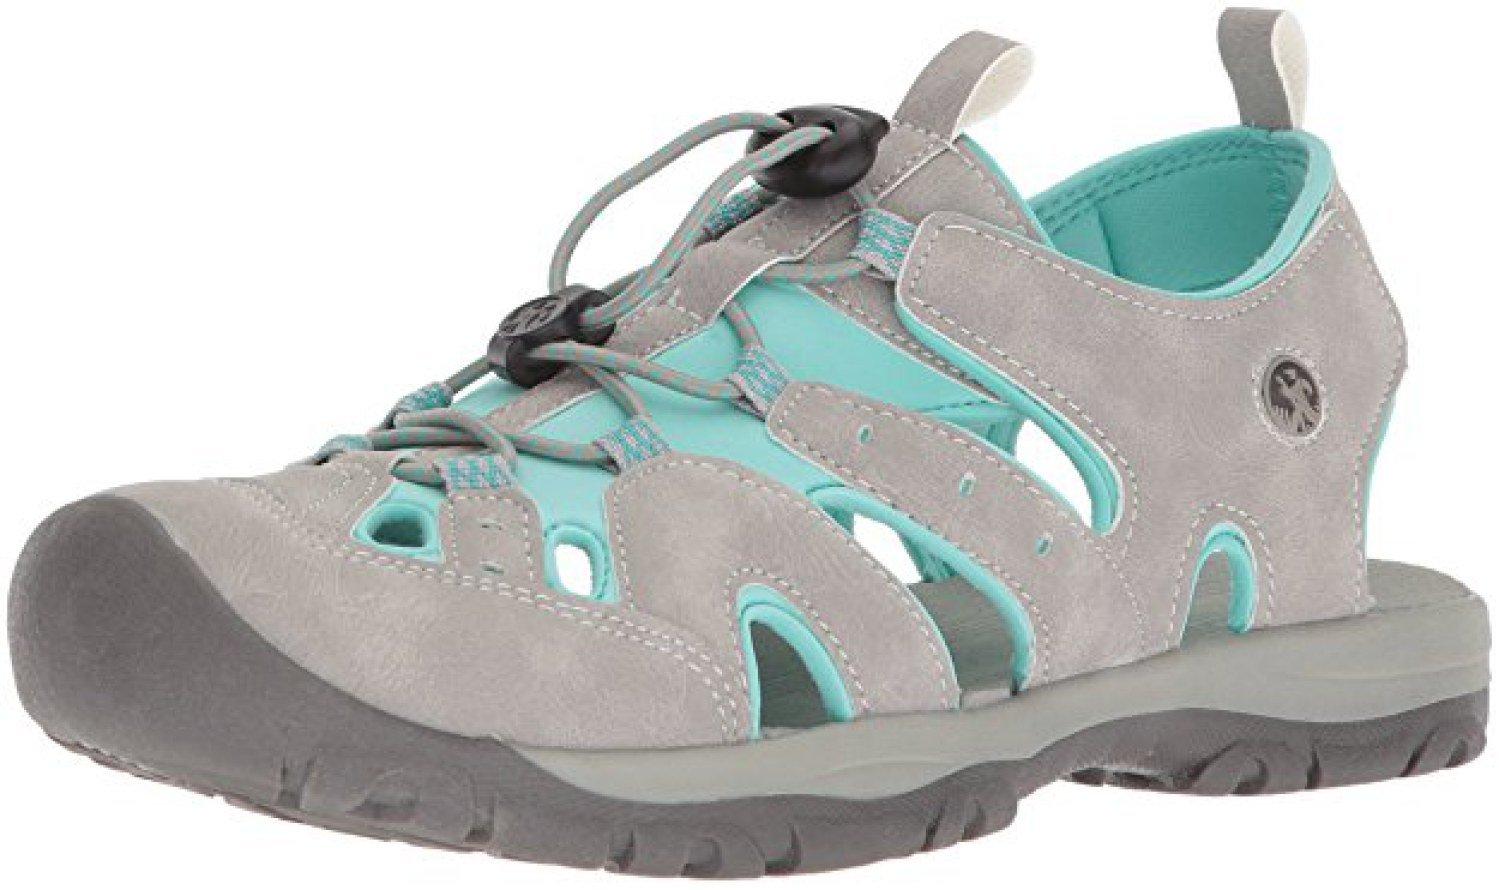 Northside Women's Burke II Athletic Summer Sandal; with a Waterproof Wet Dry Bag B07D93RKYF 8 B(M) US|Lt Gray/Turquoise